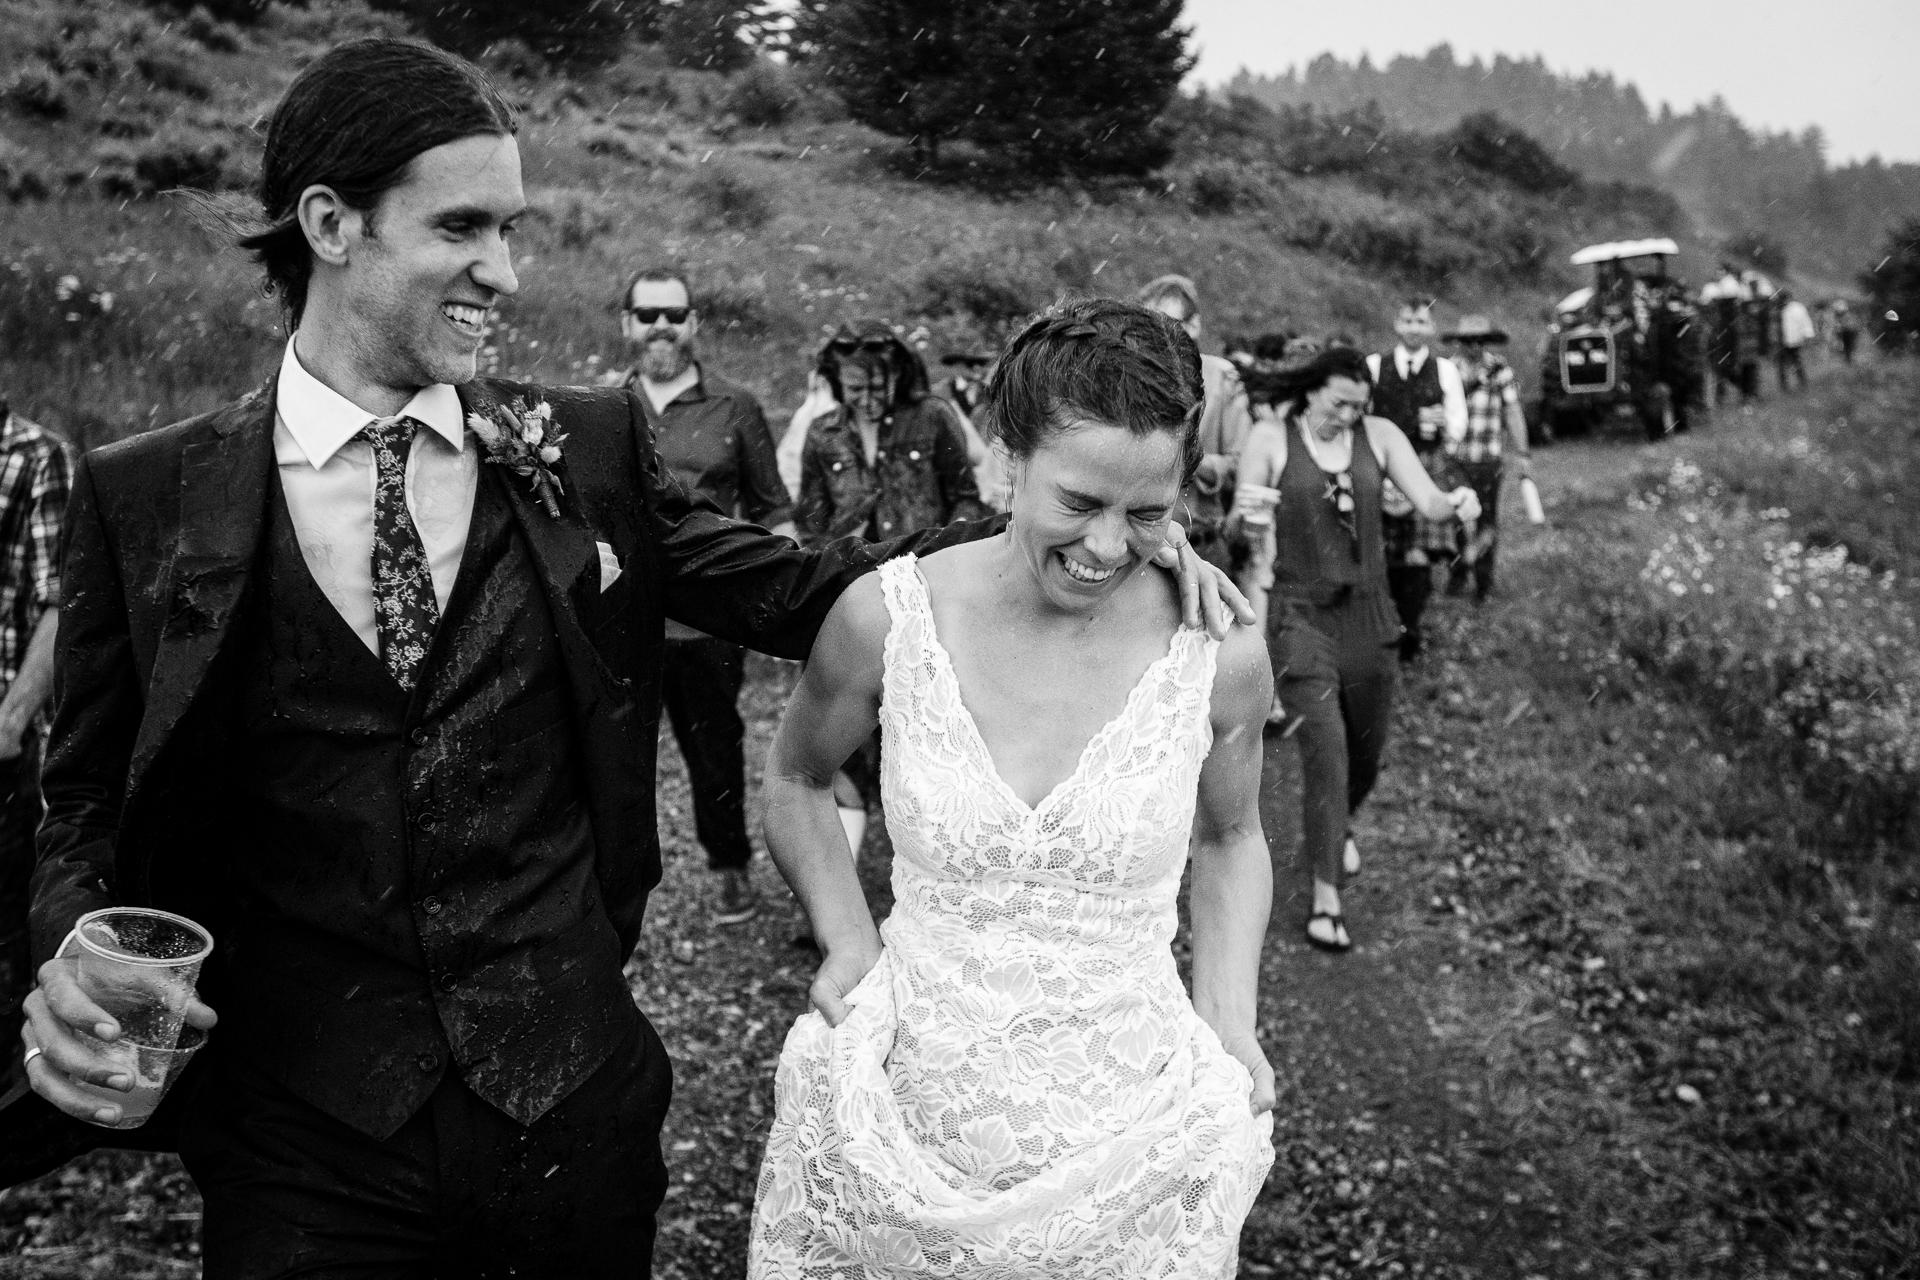 David Clumpner, of Montana, is a wedding photographer for Mountain Top near Bozeman, MT